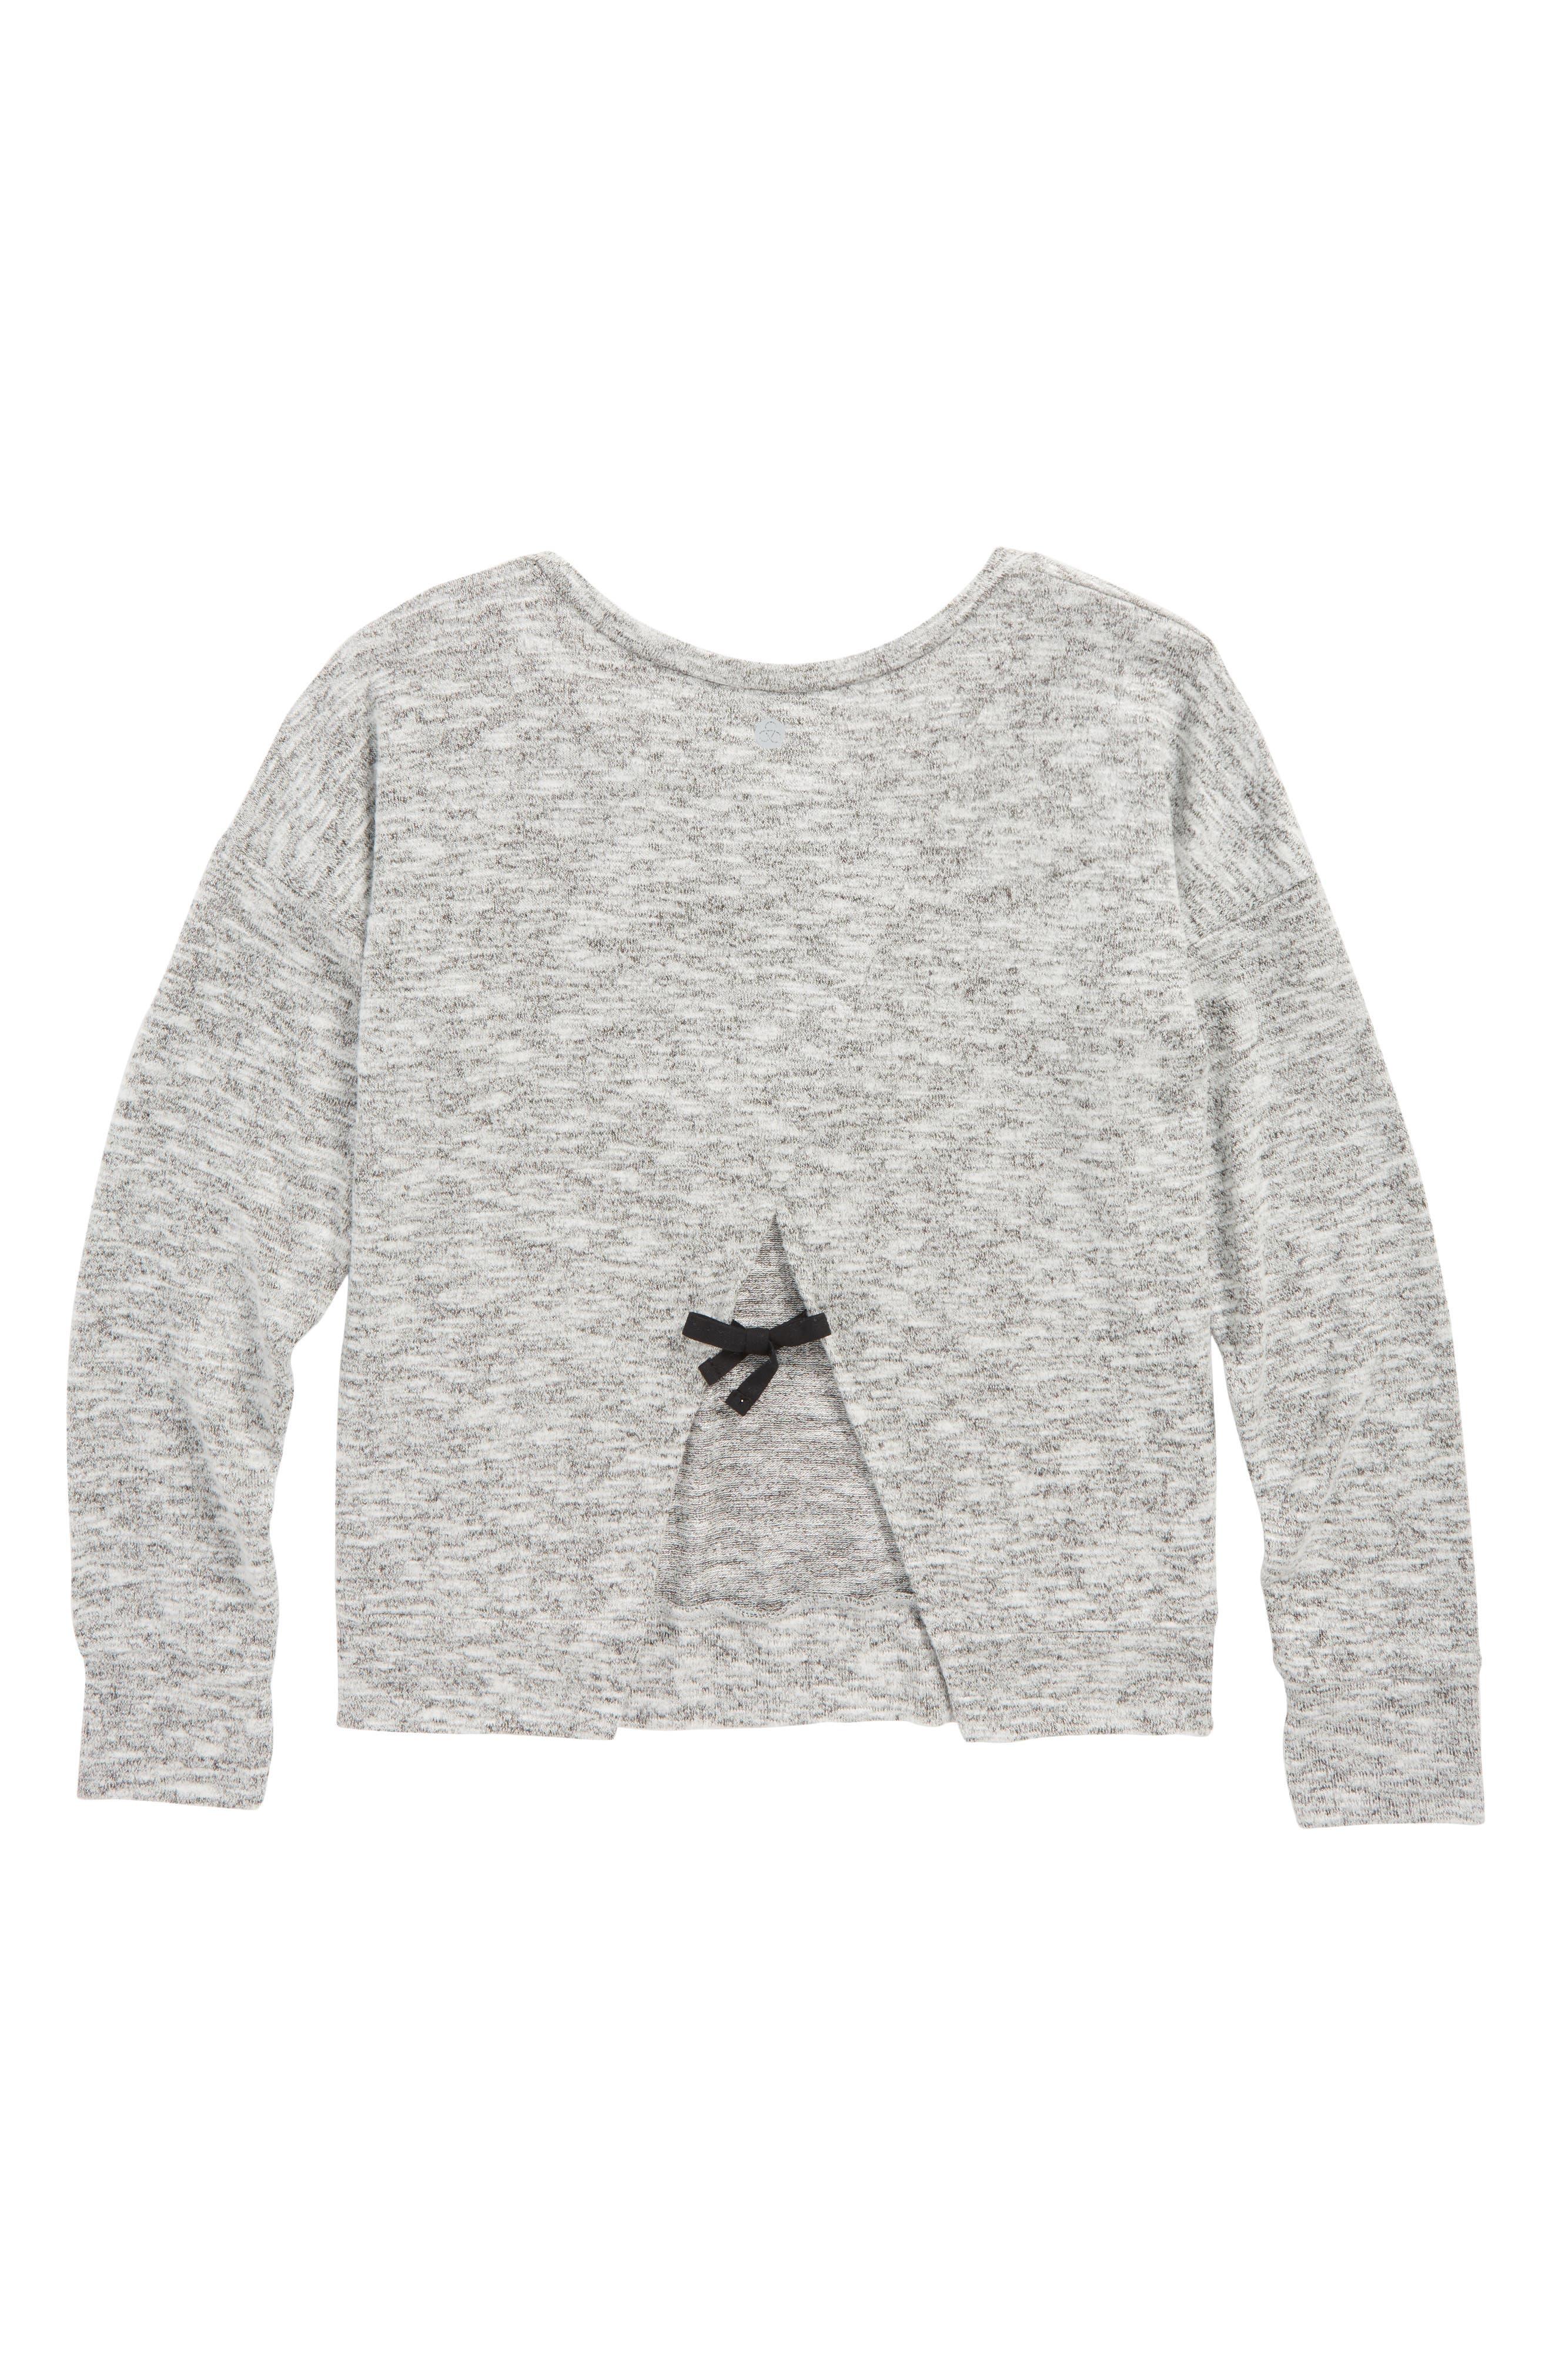 Zella Open Back Sweater,                             Alternate thumbnail 2, color,                             001